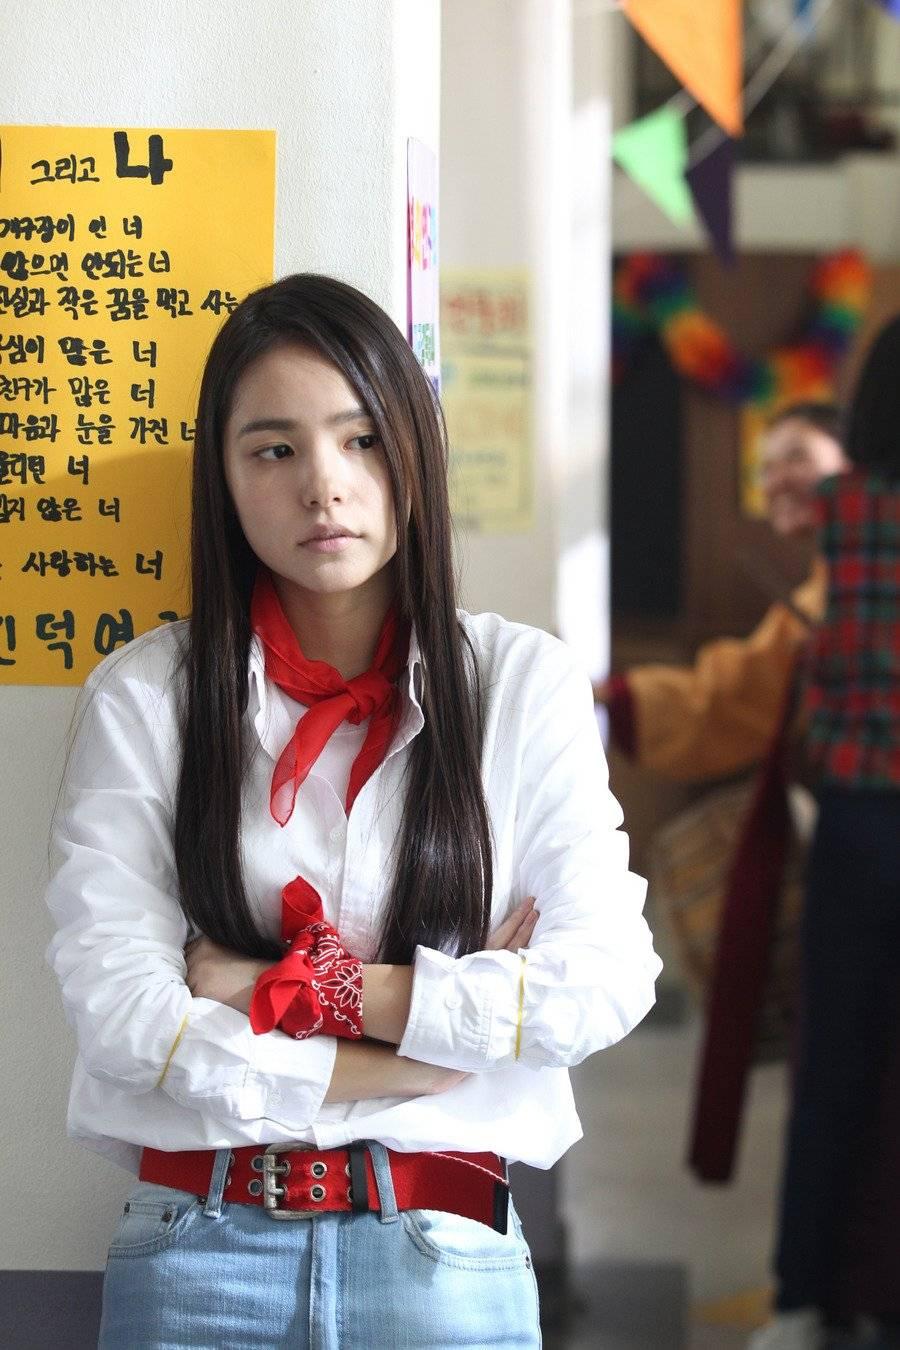 Sunny - 2010 (써니) - Movie - Picture Gallery @ HanCinema